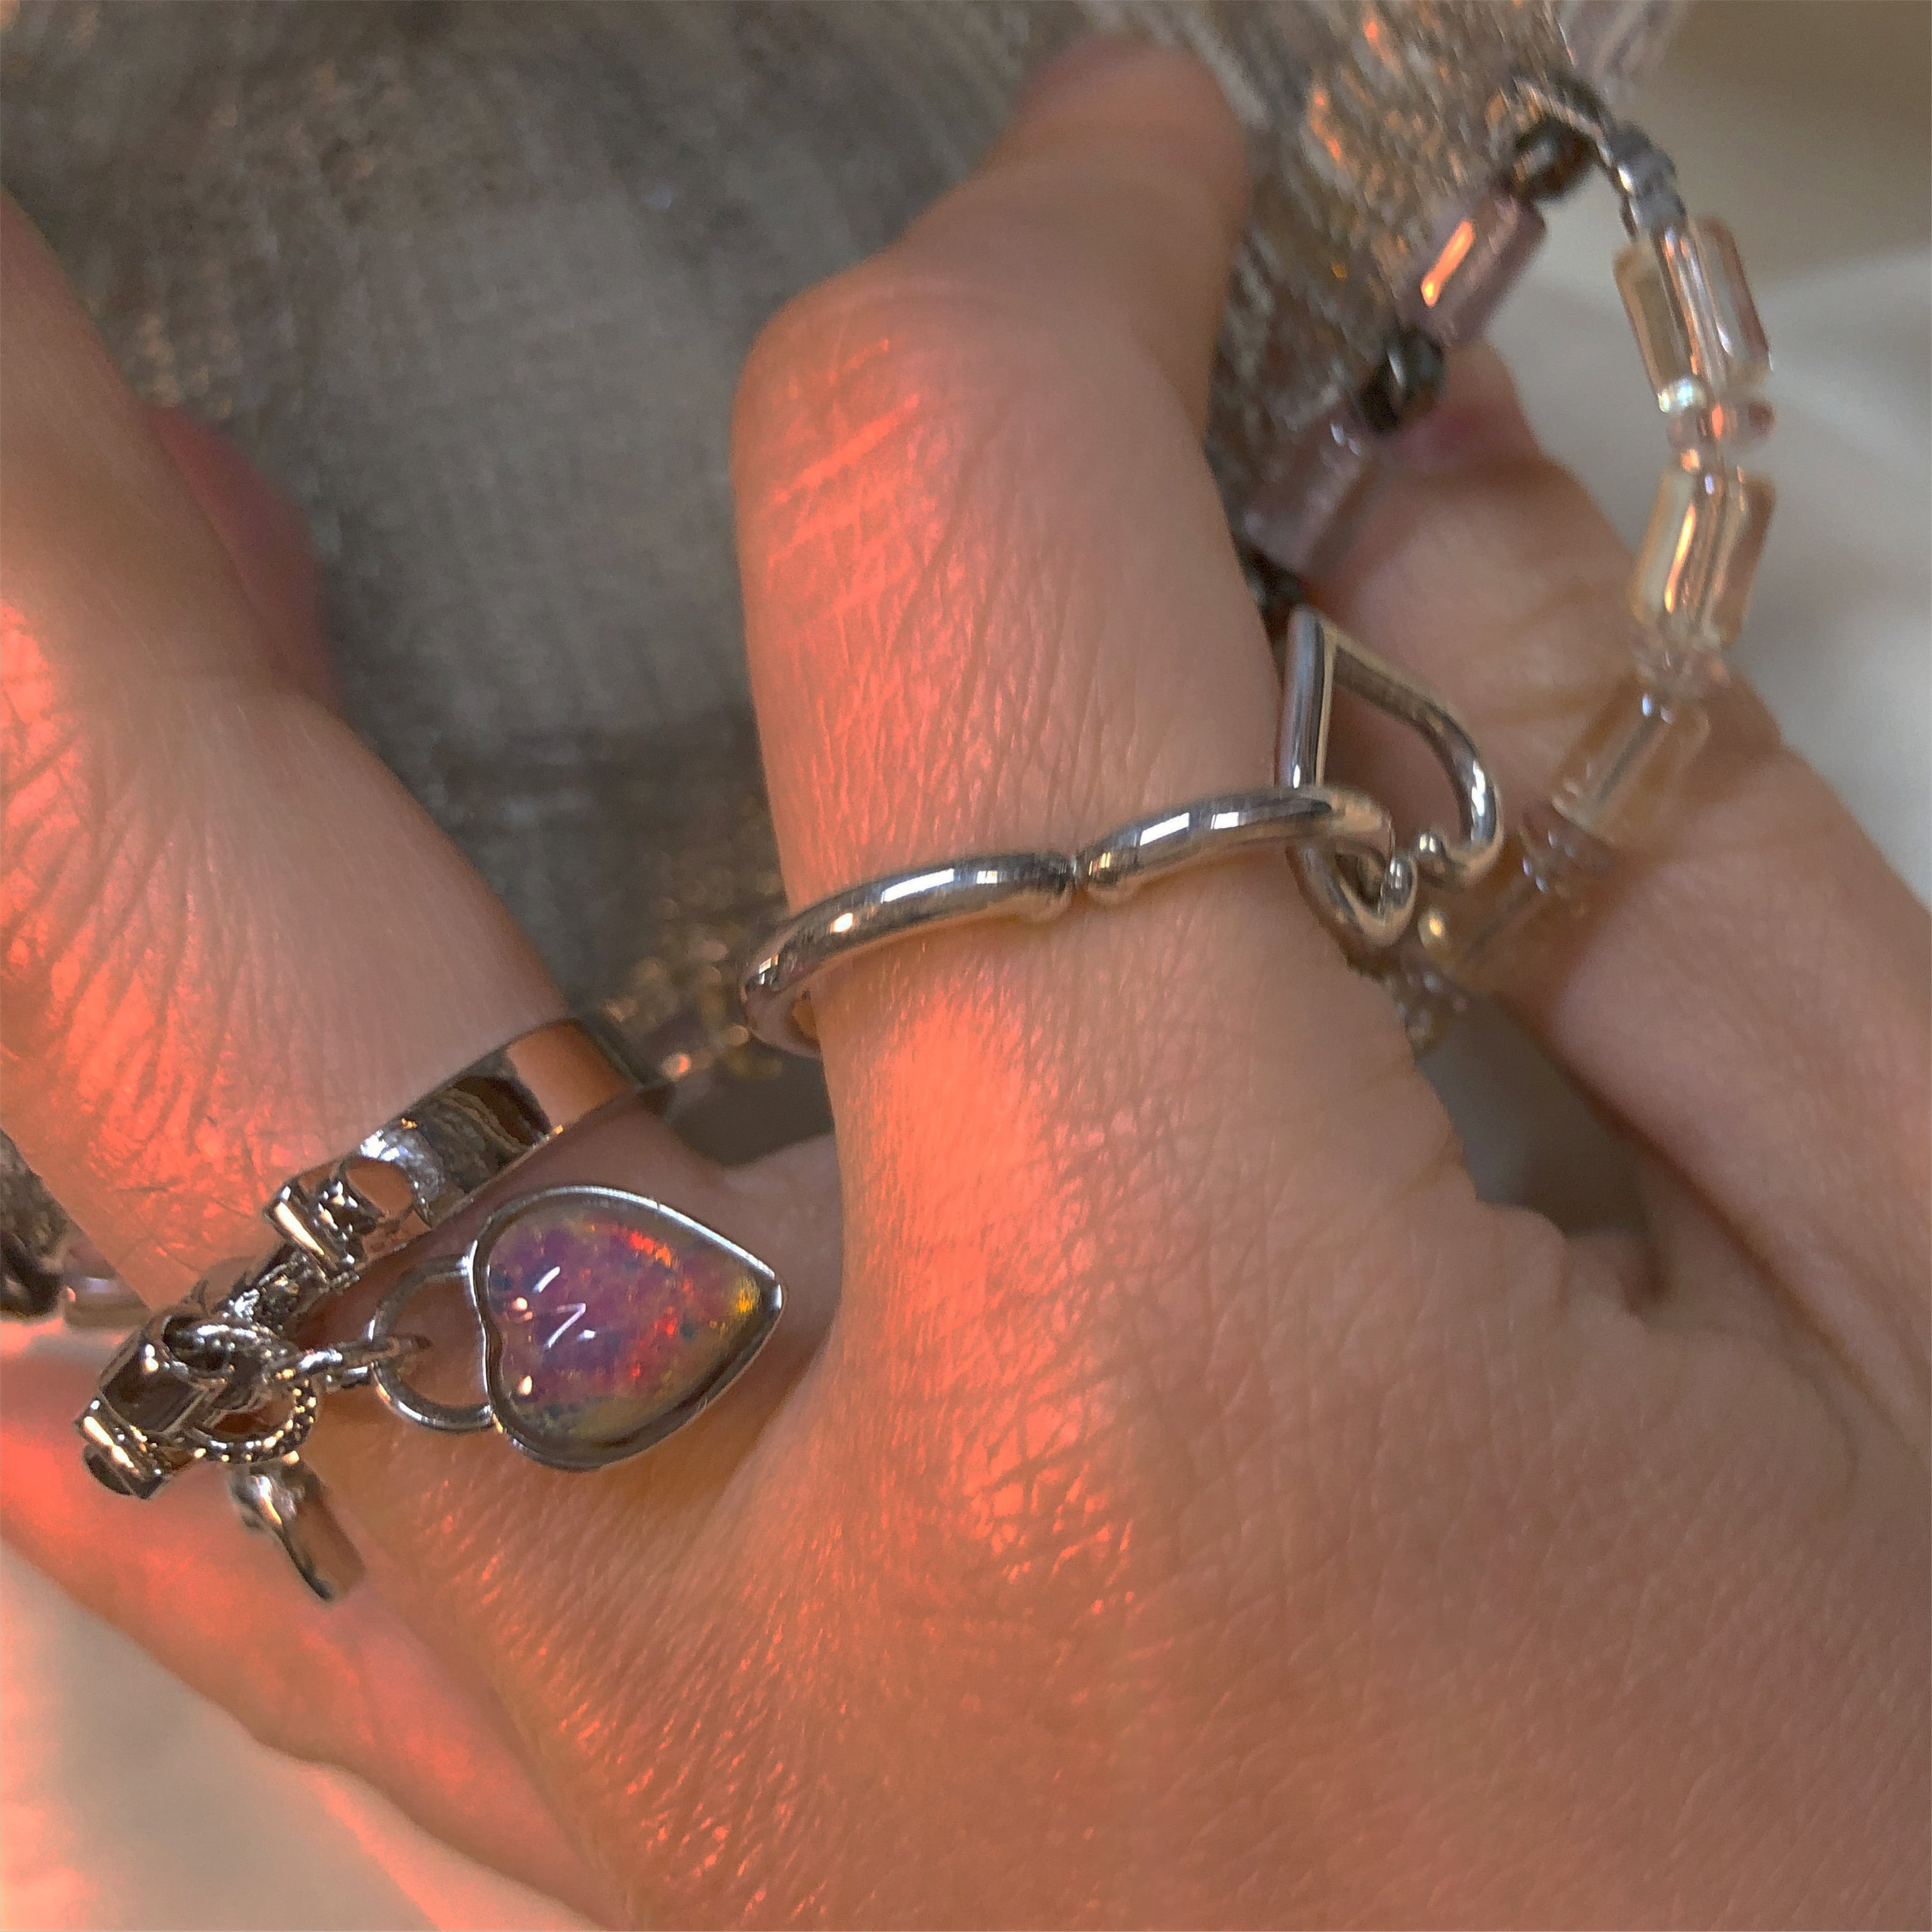 pink opal vintageガラスの鍵RING #1732 ピンクオパールヴィンテージガラスの鍵リング